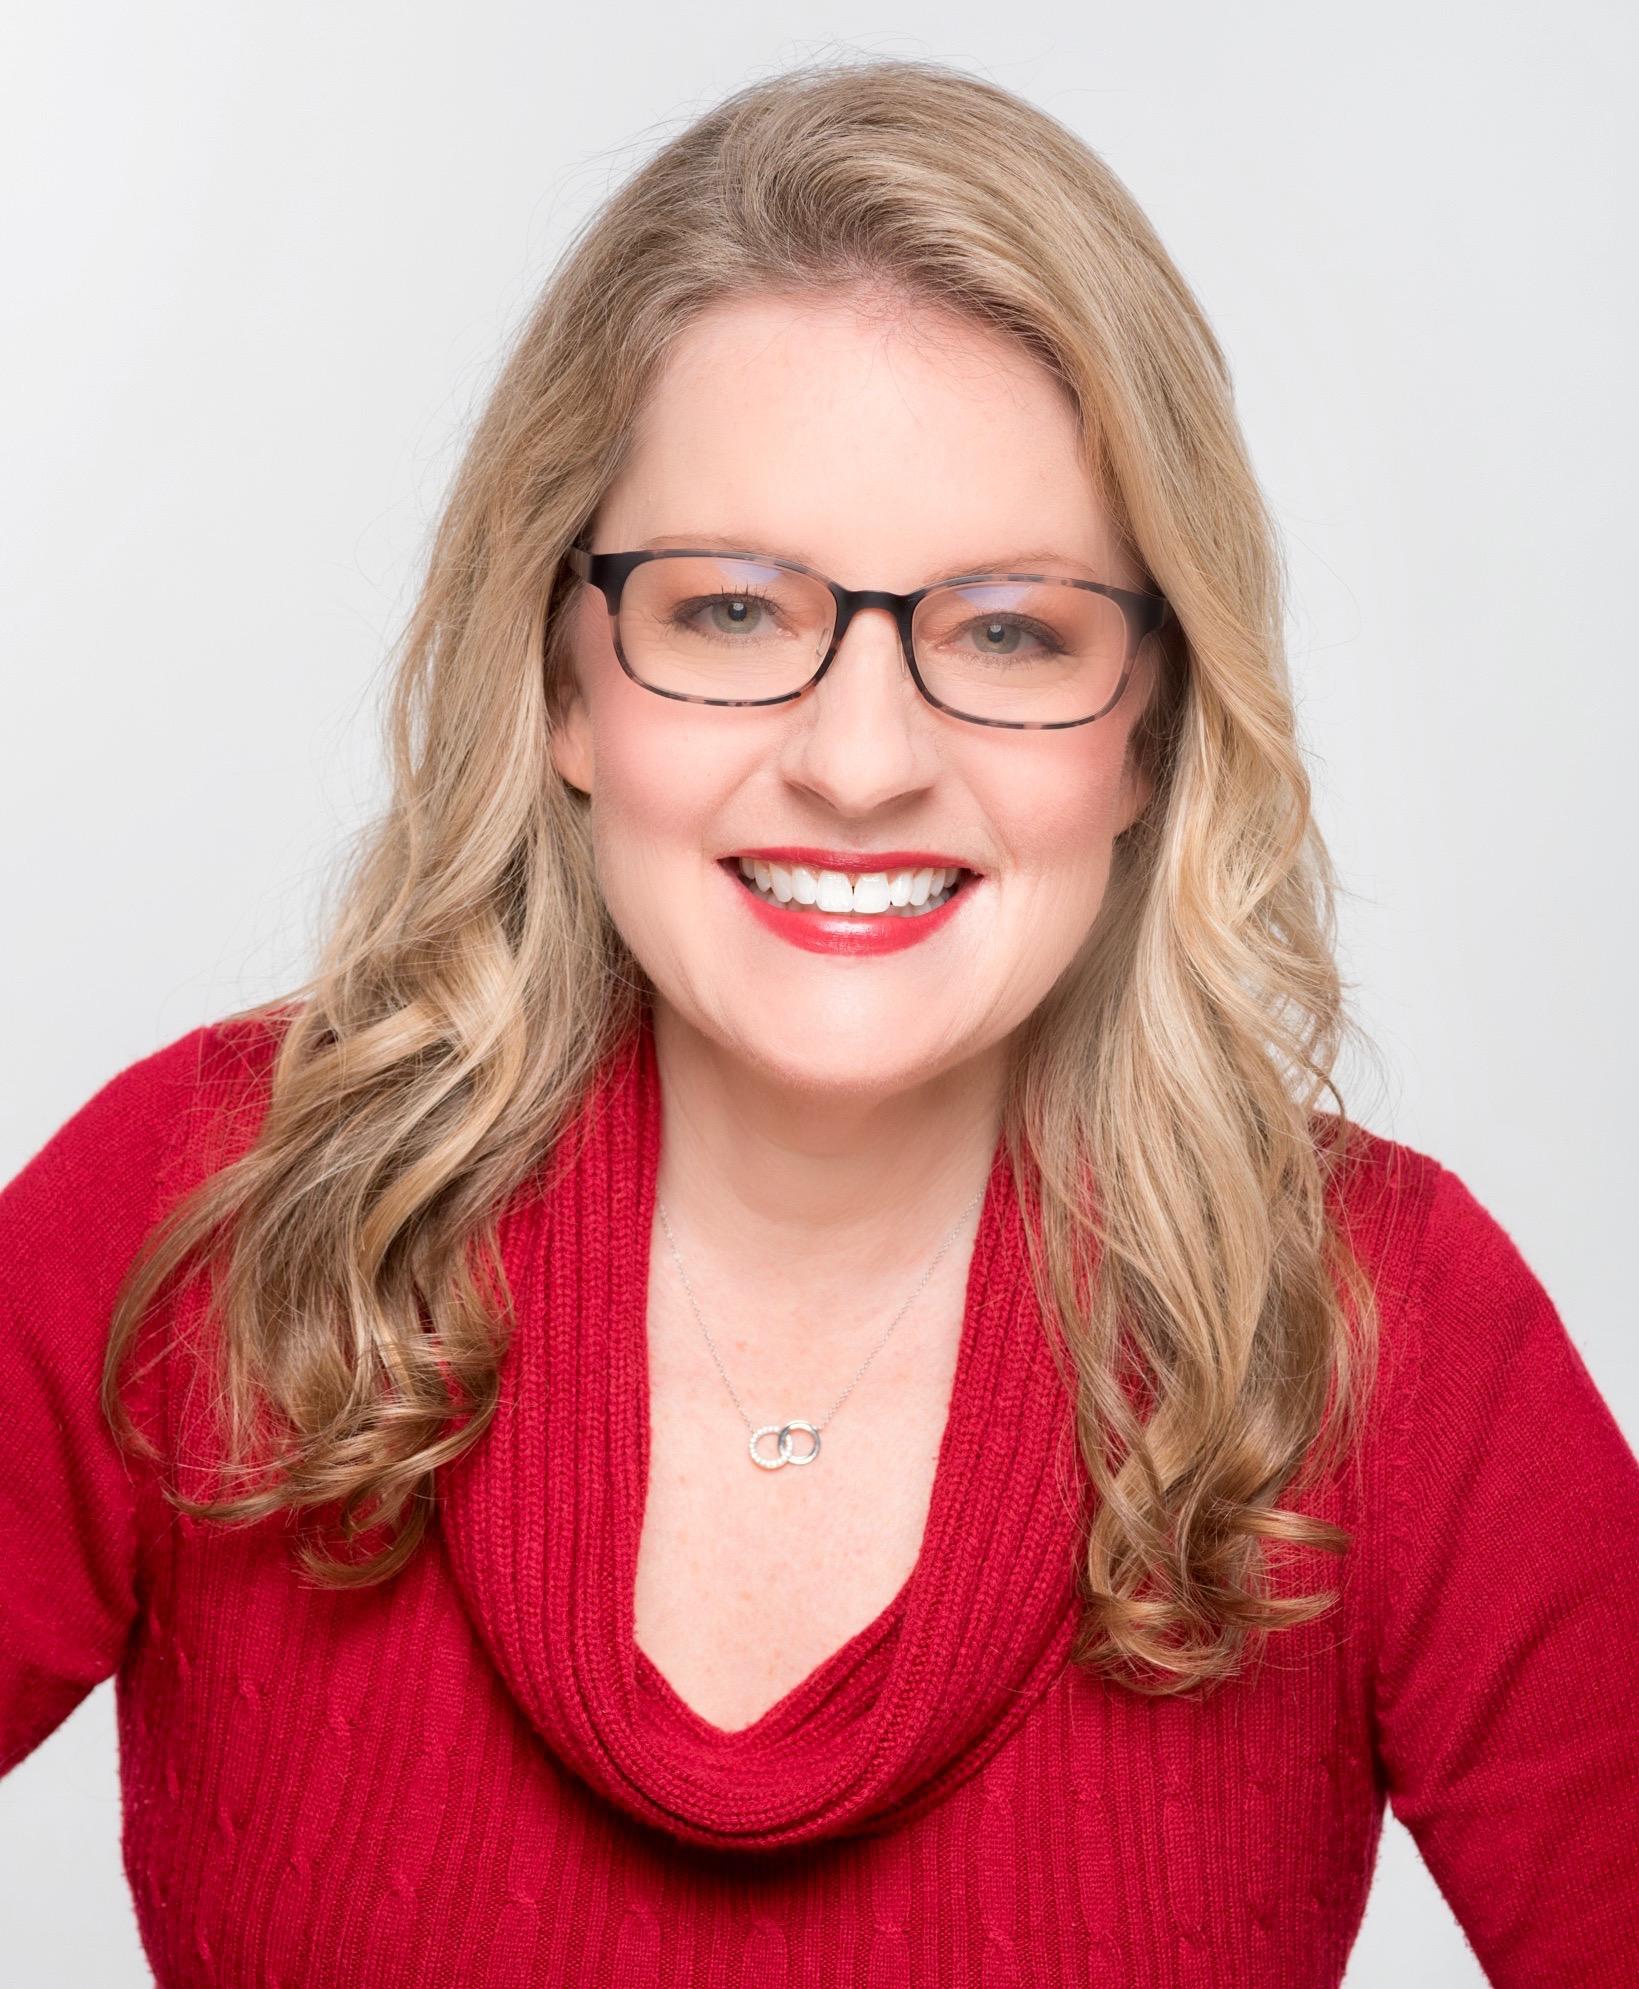 Elisa Red Glasses 5-29-20